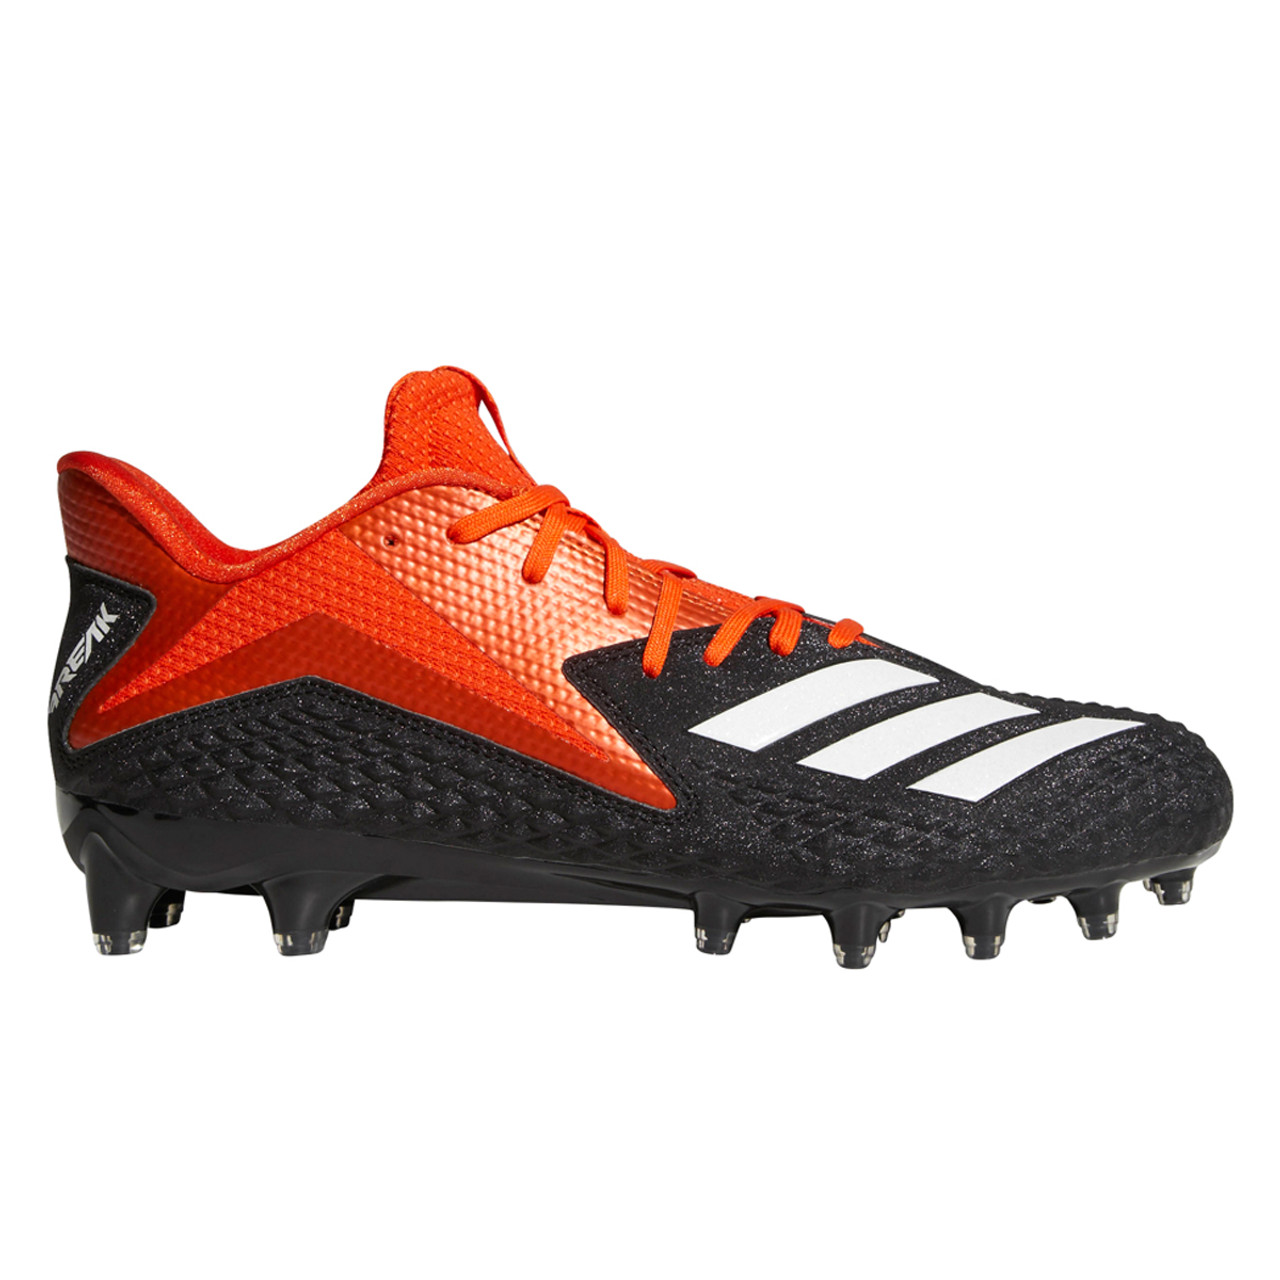 173883b741e7cf Adidas Freak x Carbon Men s Football Cleats CG4392 - Black